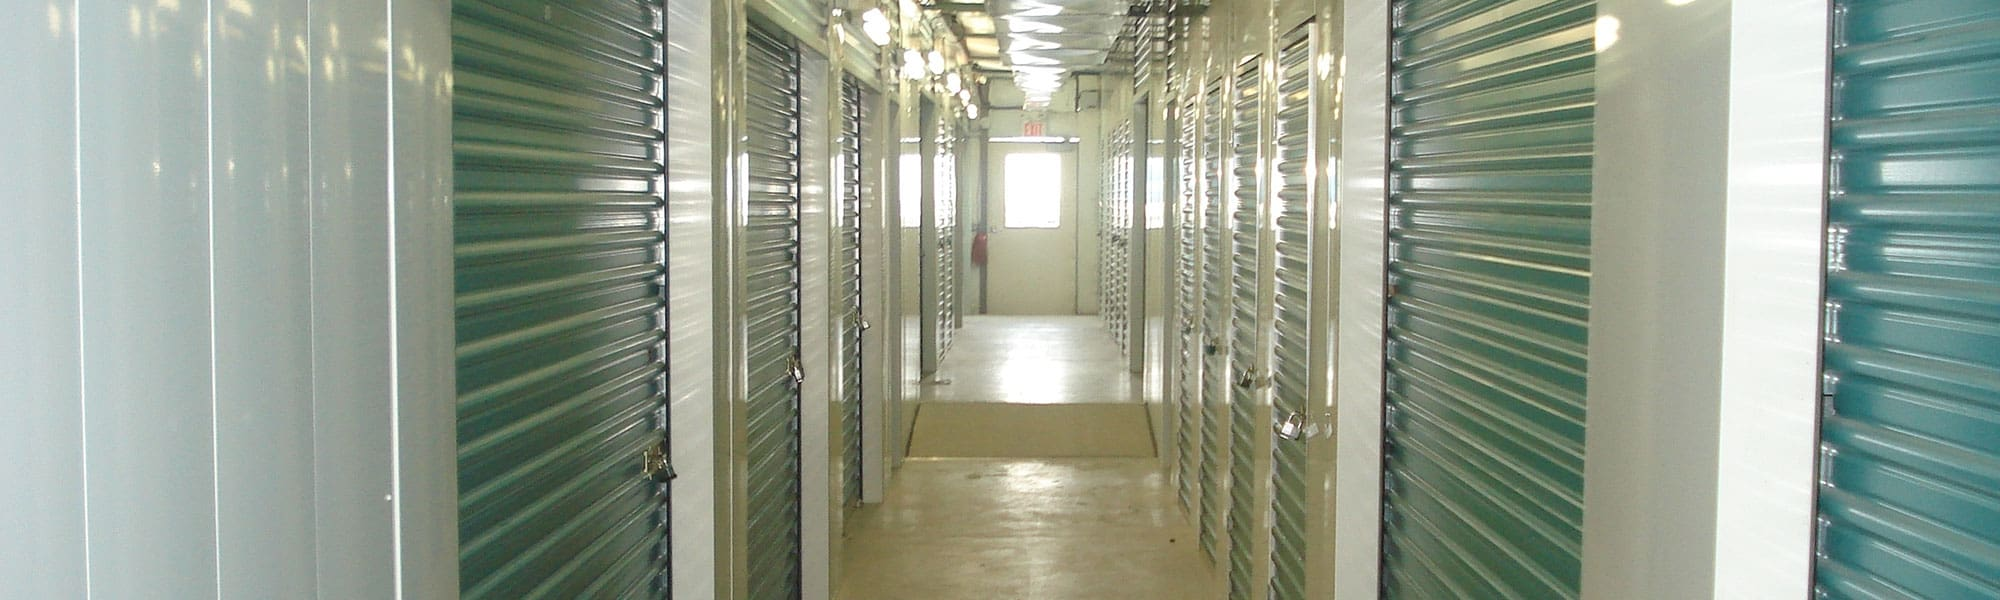 Self storage in Michigan City